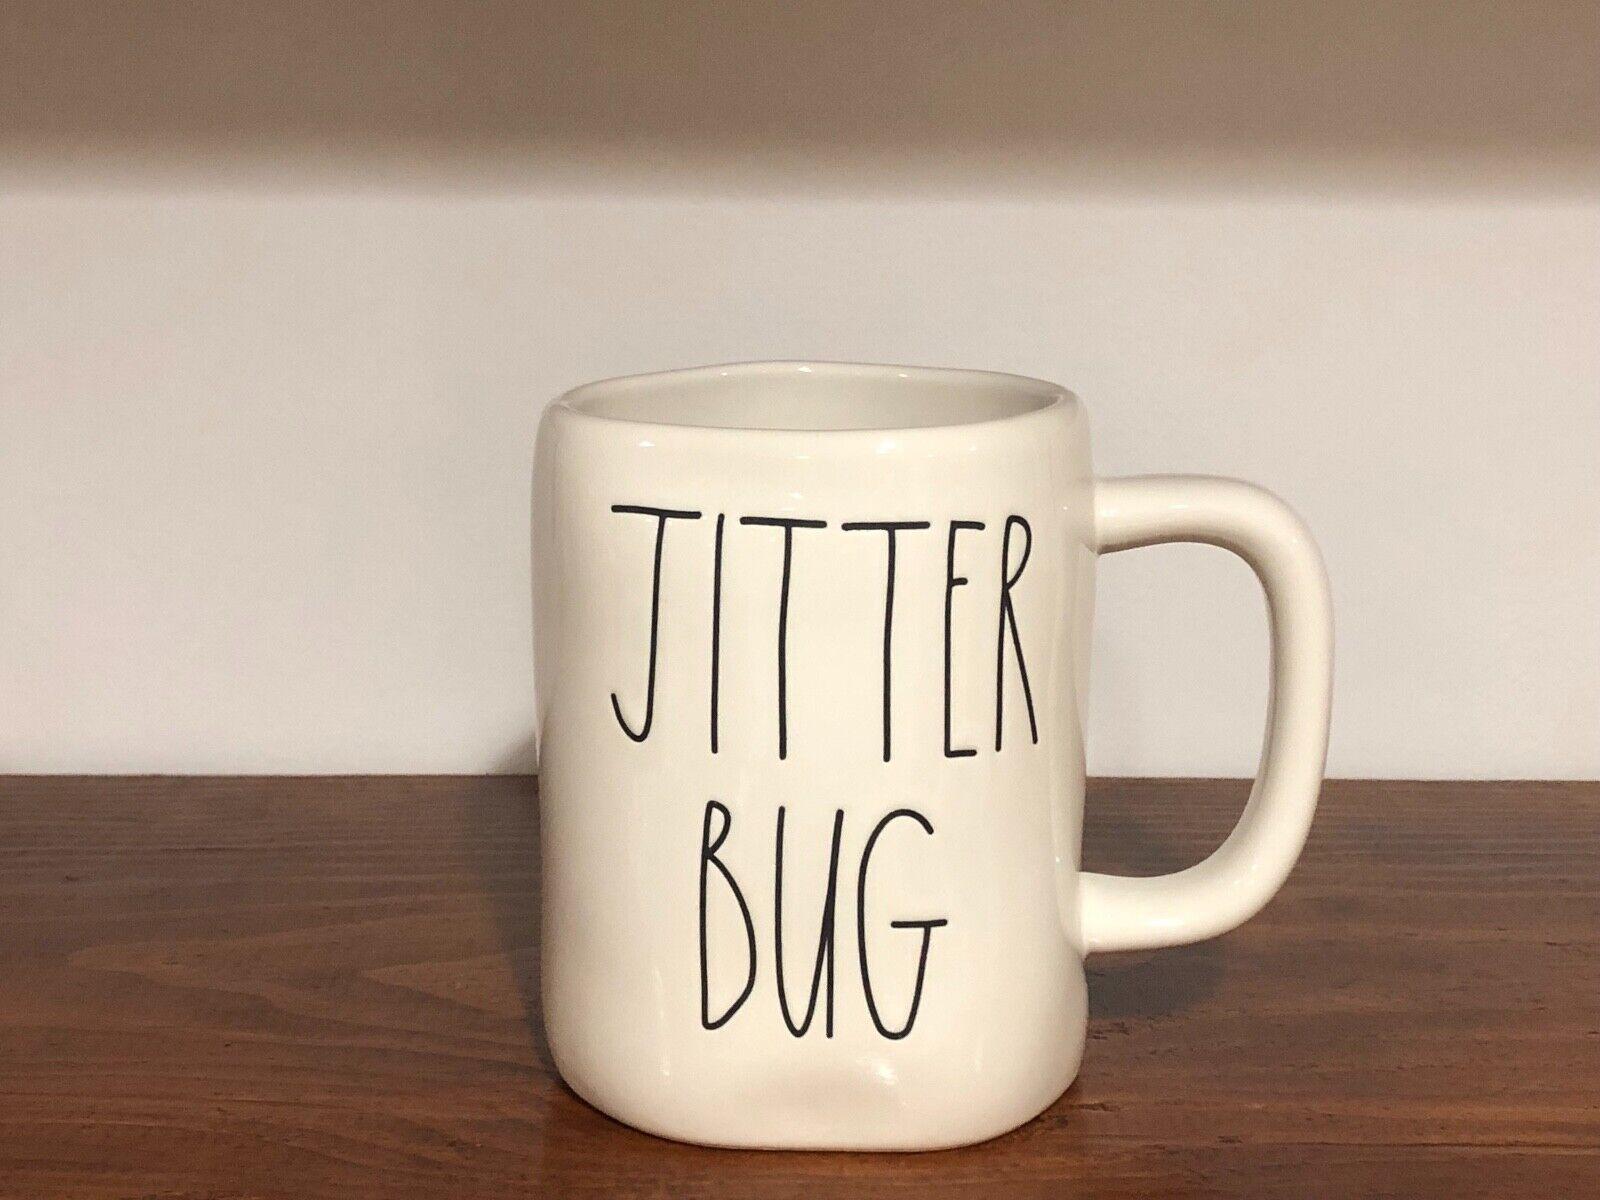 Rae Dunn Artisan Collection By Magenta Farmhouse LL Large Letter Coffee Tea Mug JITTER BUG